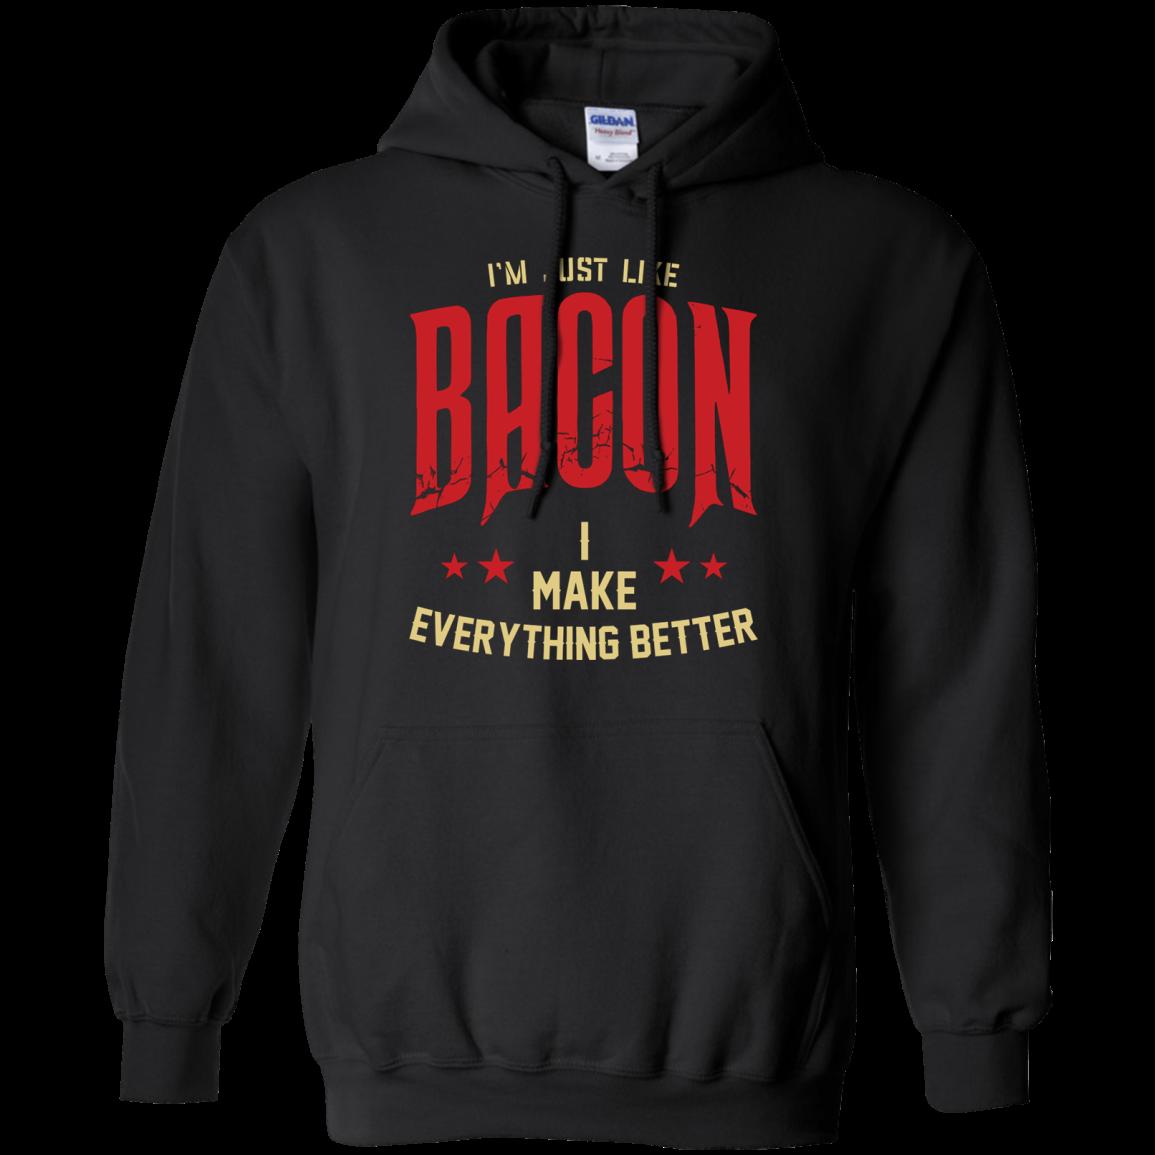 New CALIFORNIA  Republic Hoodie pullover black sweatshirt FREE SHIPPING UNISEX